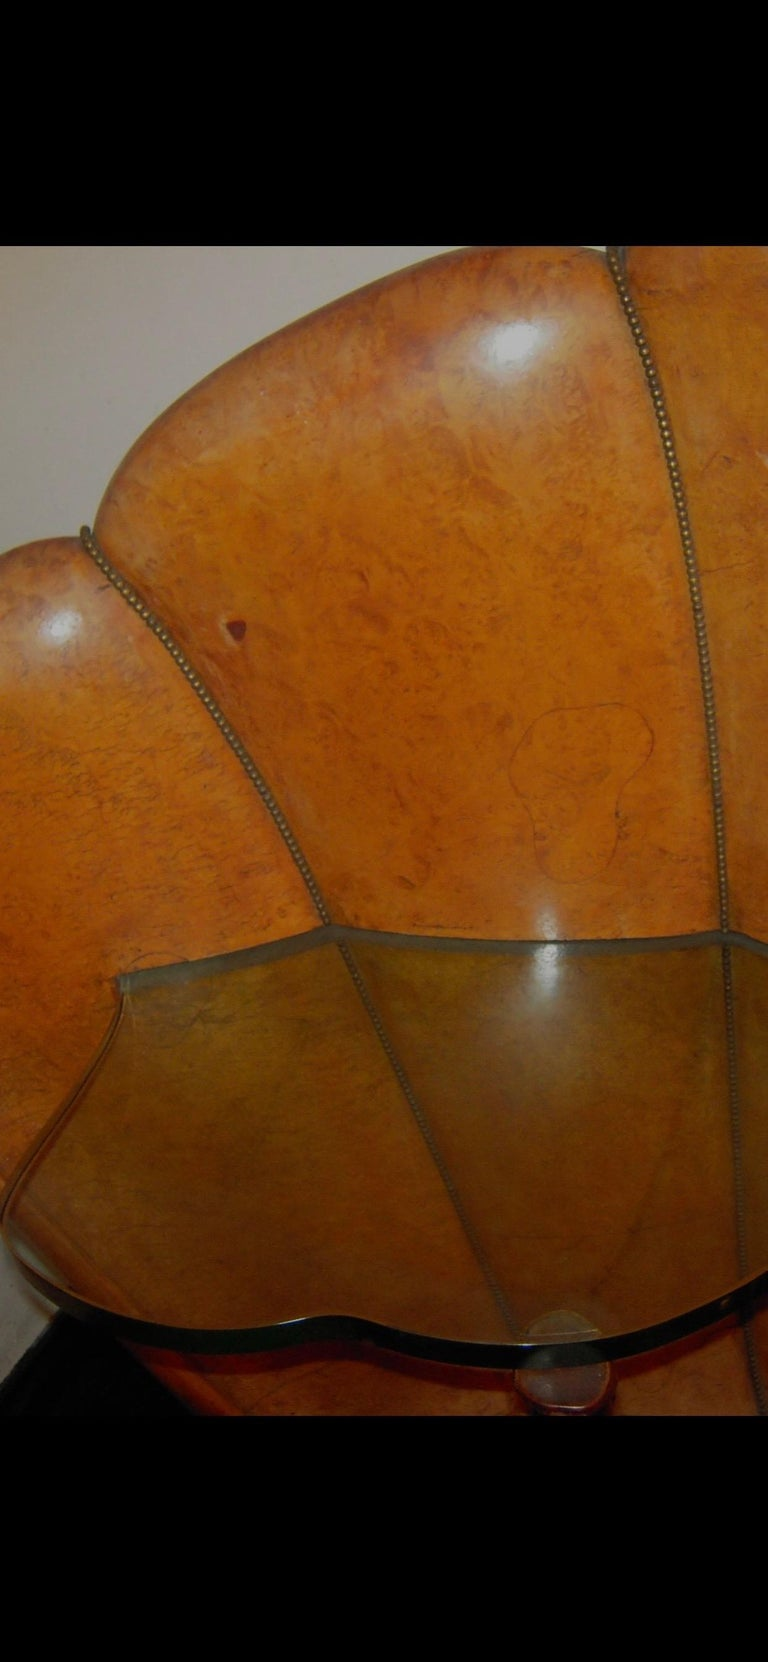 Italian Burled Walnut Art Deco Headboard with Shell Shaped Nightstands, 1920s For Sale 3